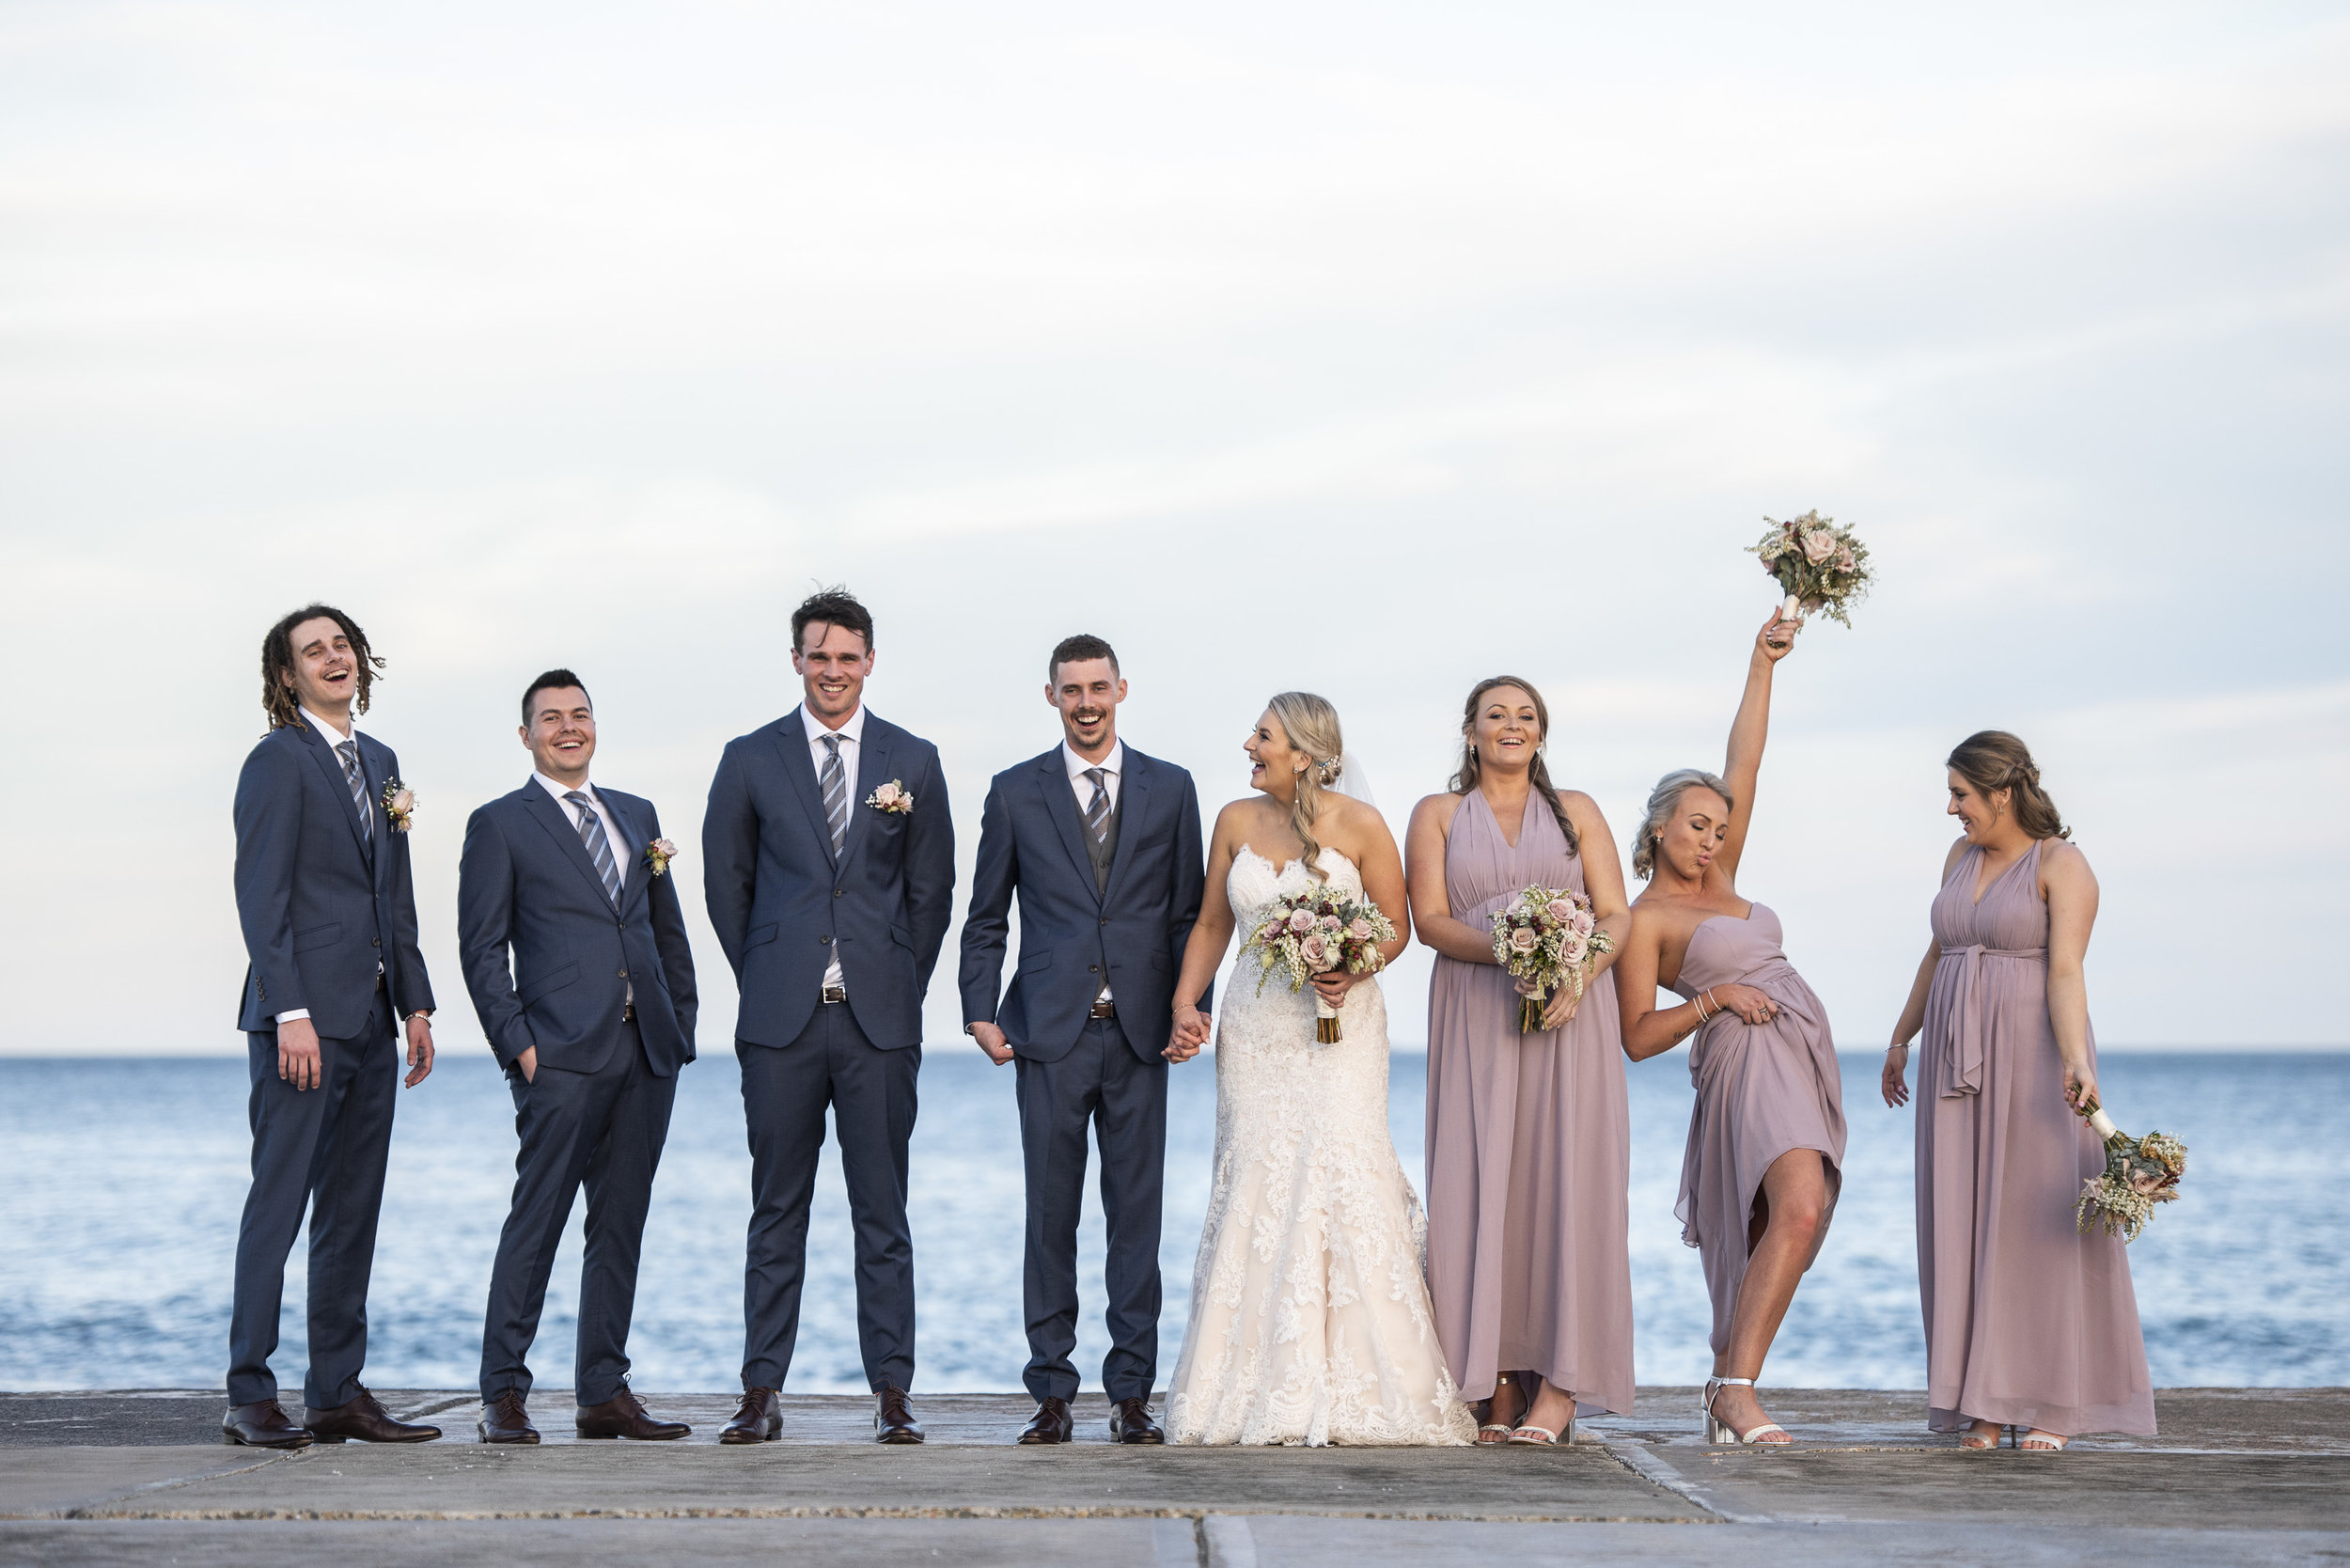 weddings by atelier photography-wedding-11.jpg